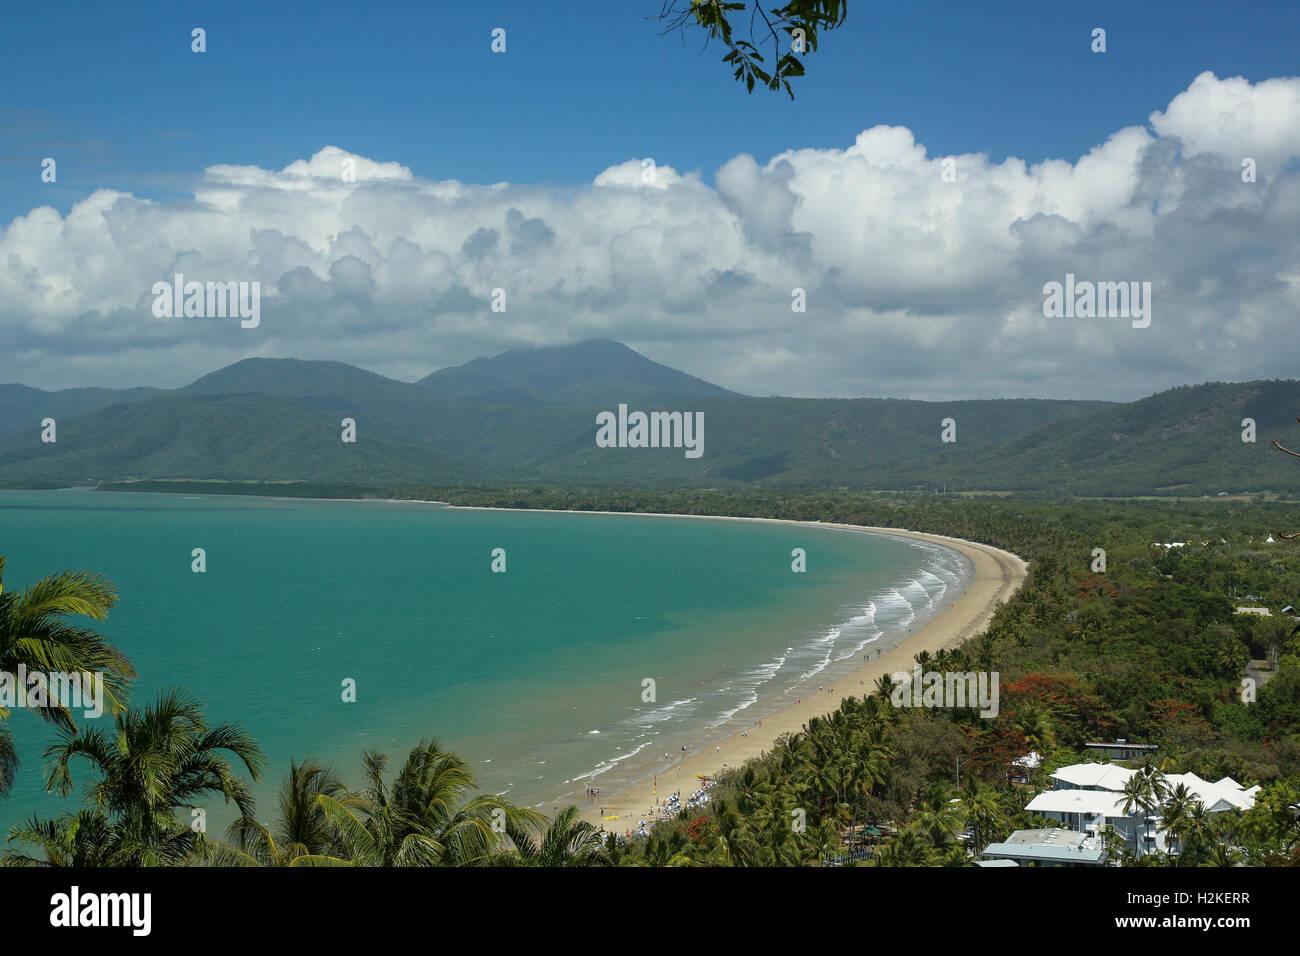 Tropical Four Mile Beach at Port Douglas, Queensland, Australia - Stock Image